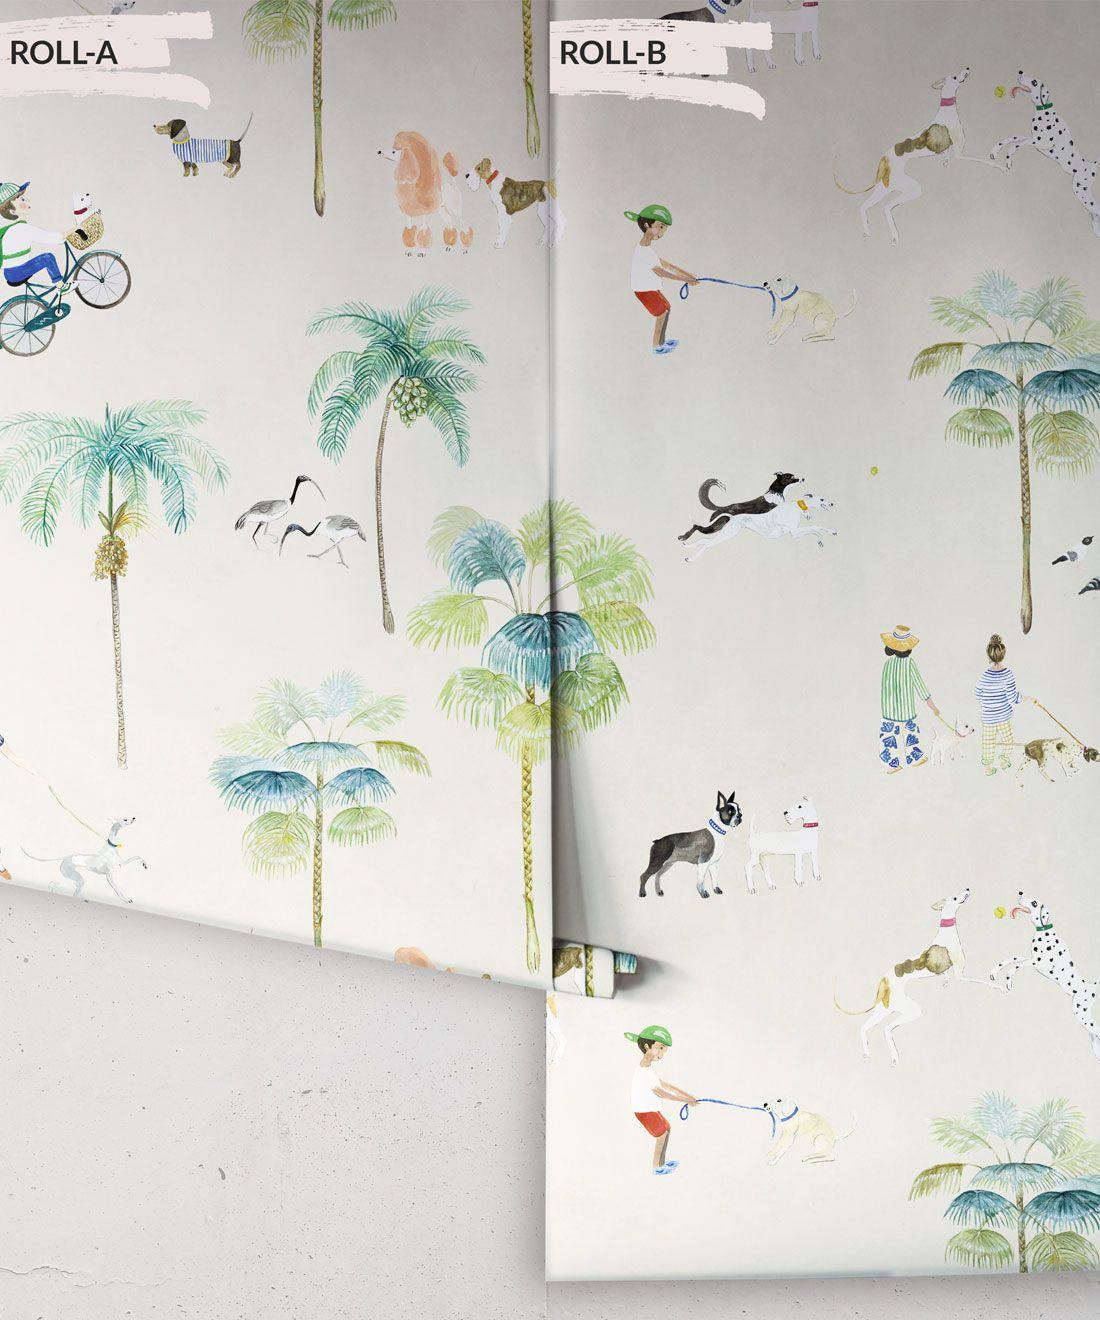 At The Dog Park Wallpaper •Kids Wallpaper • Cream • Rolls